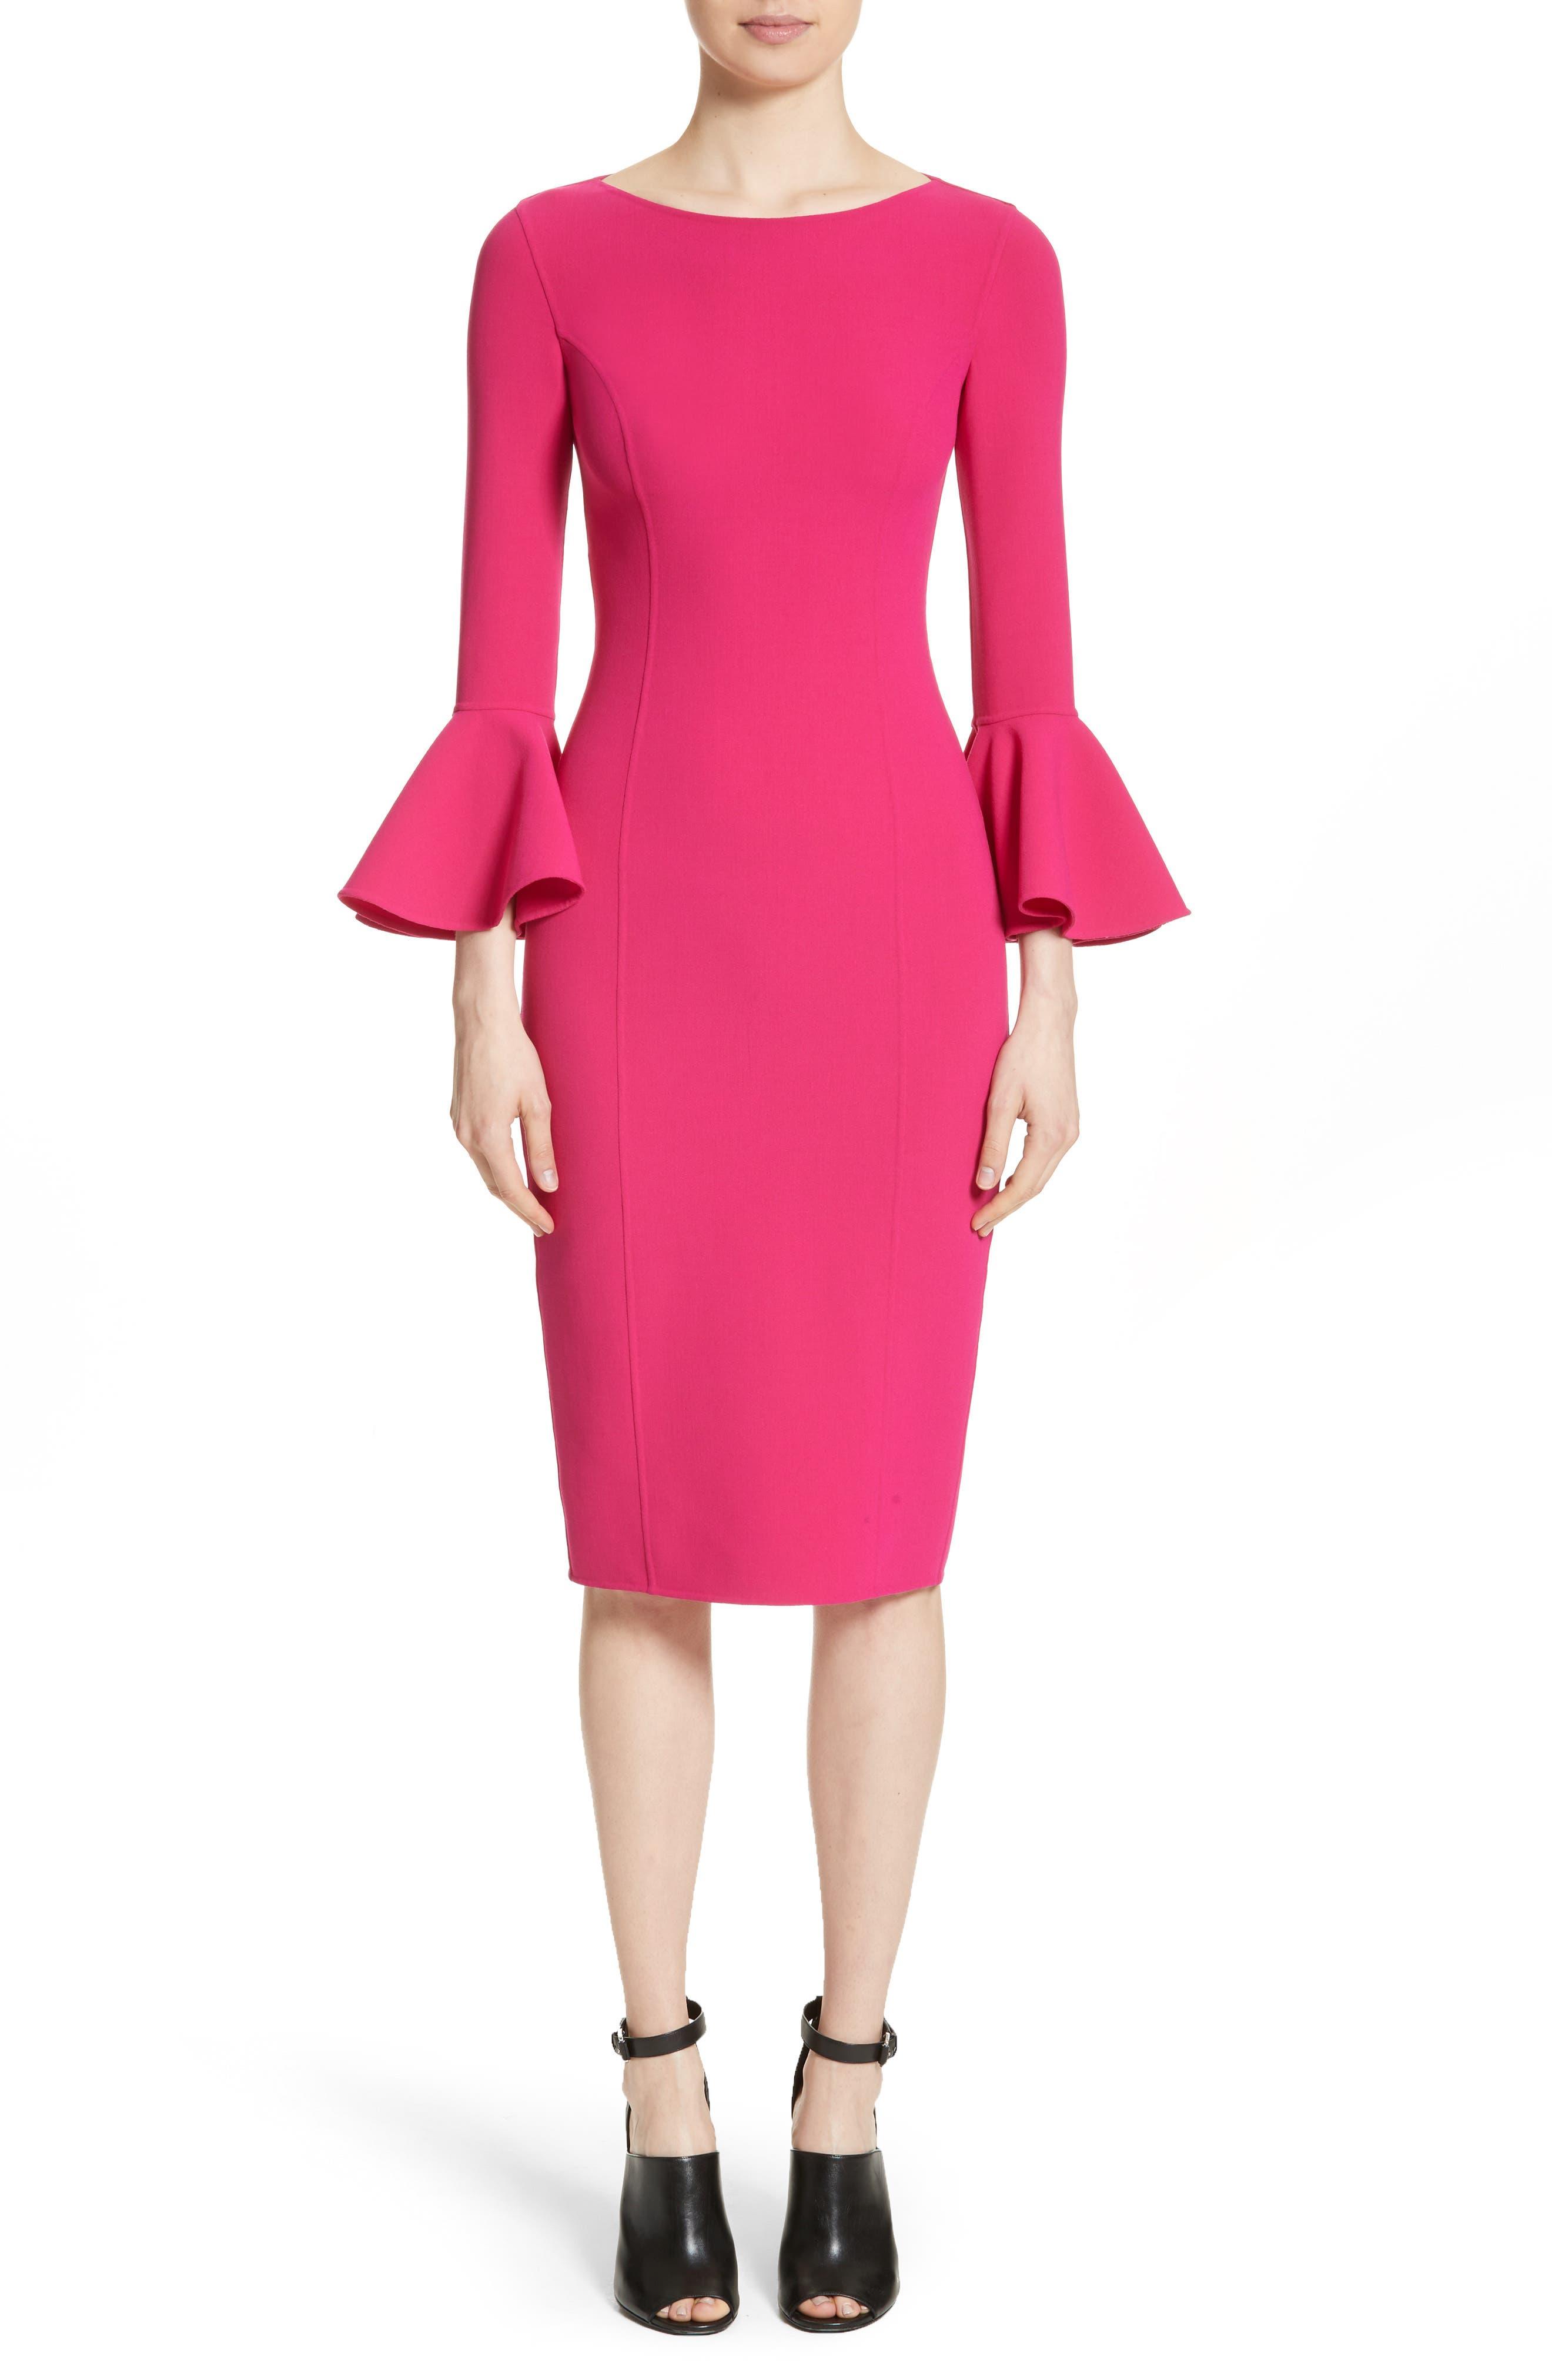 Alternate Image 1 Selected - Michael Kors Bell Cuff Sheath Dress